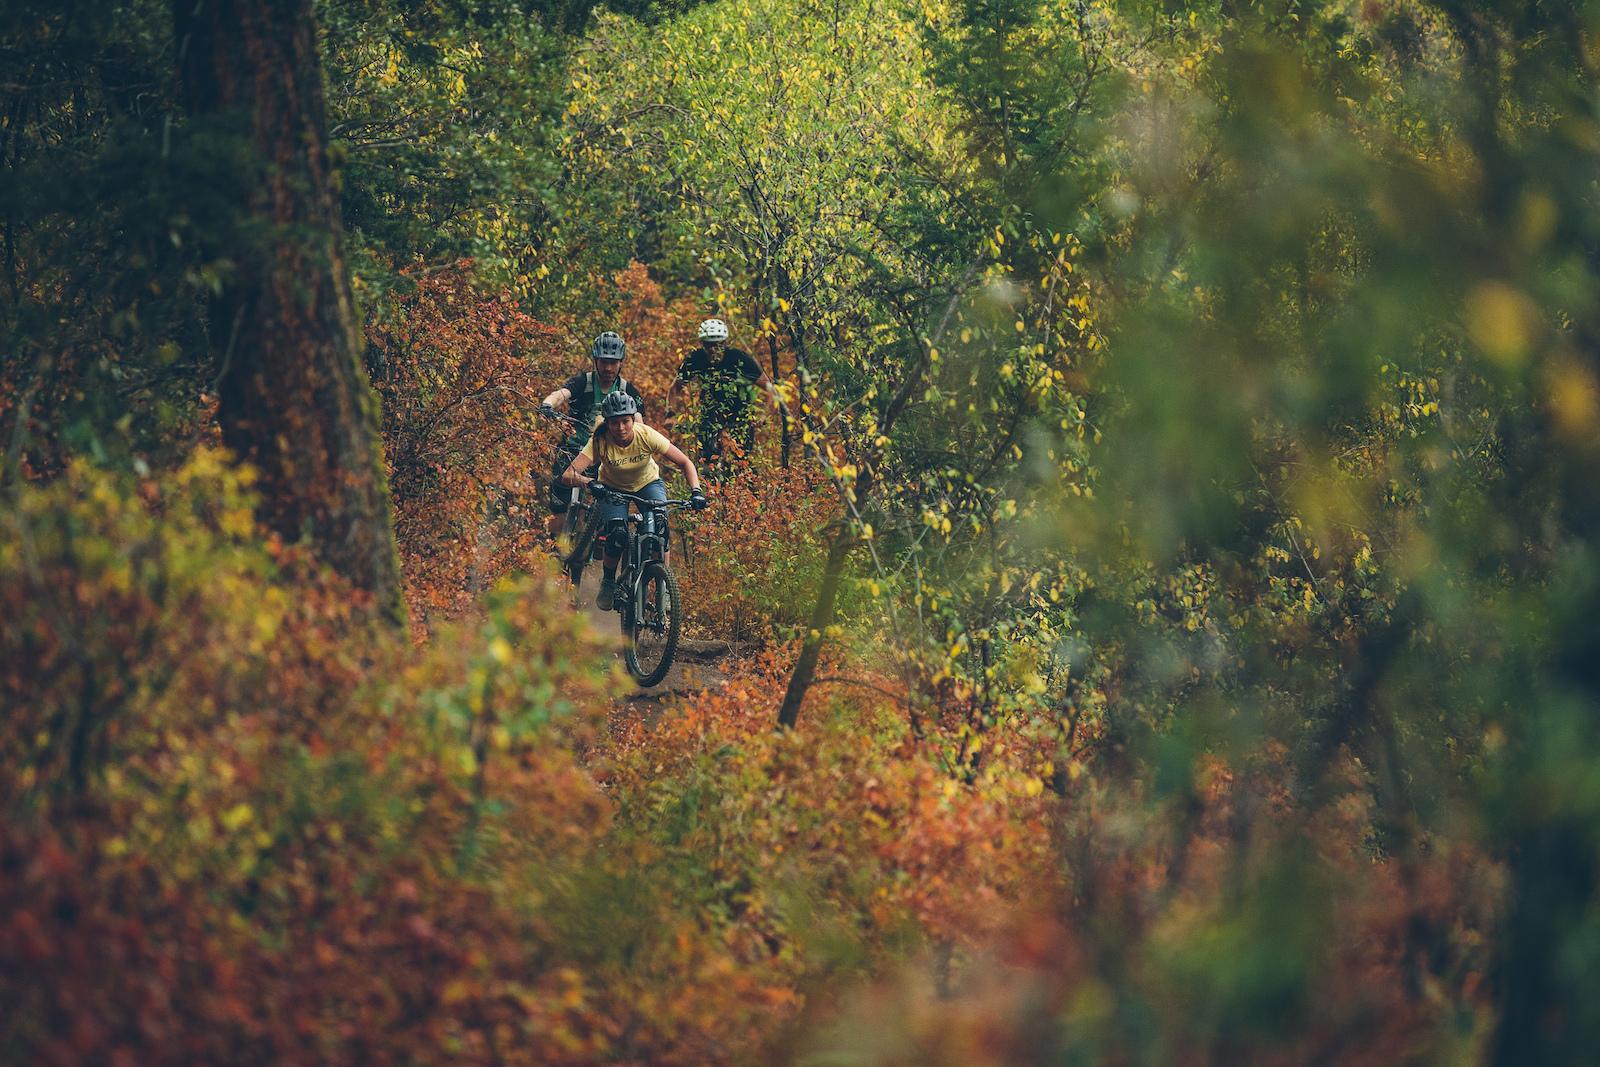 April Zastrow weaving through the fall foliac on Stackrock Trail